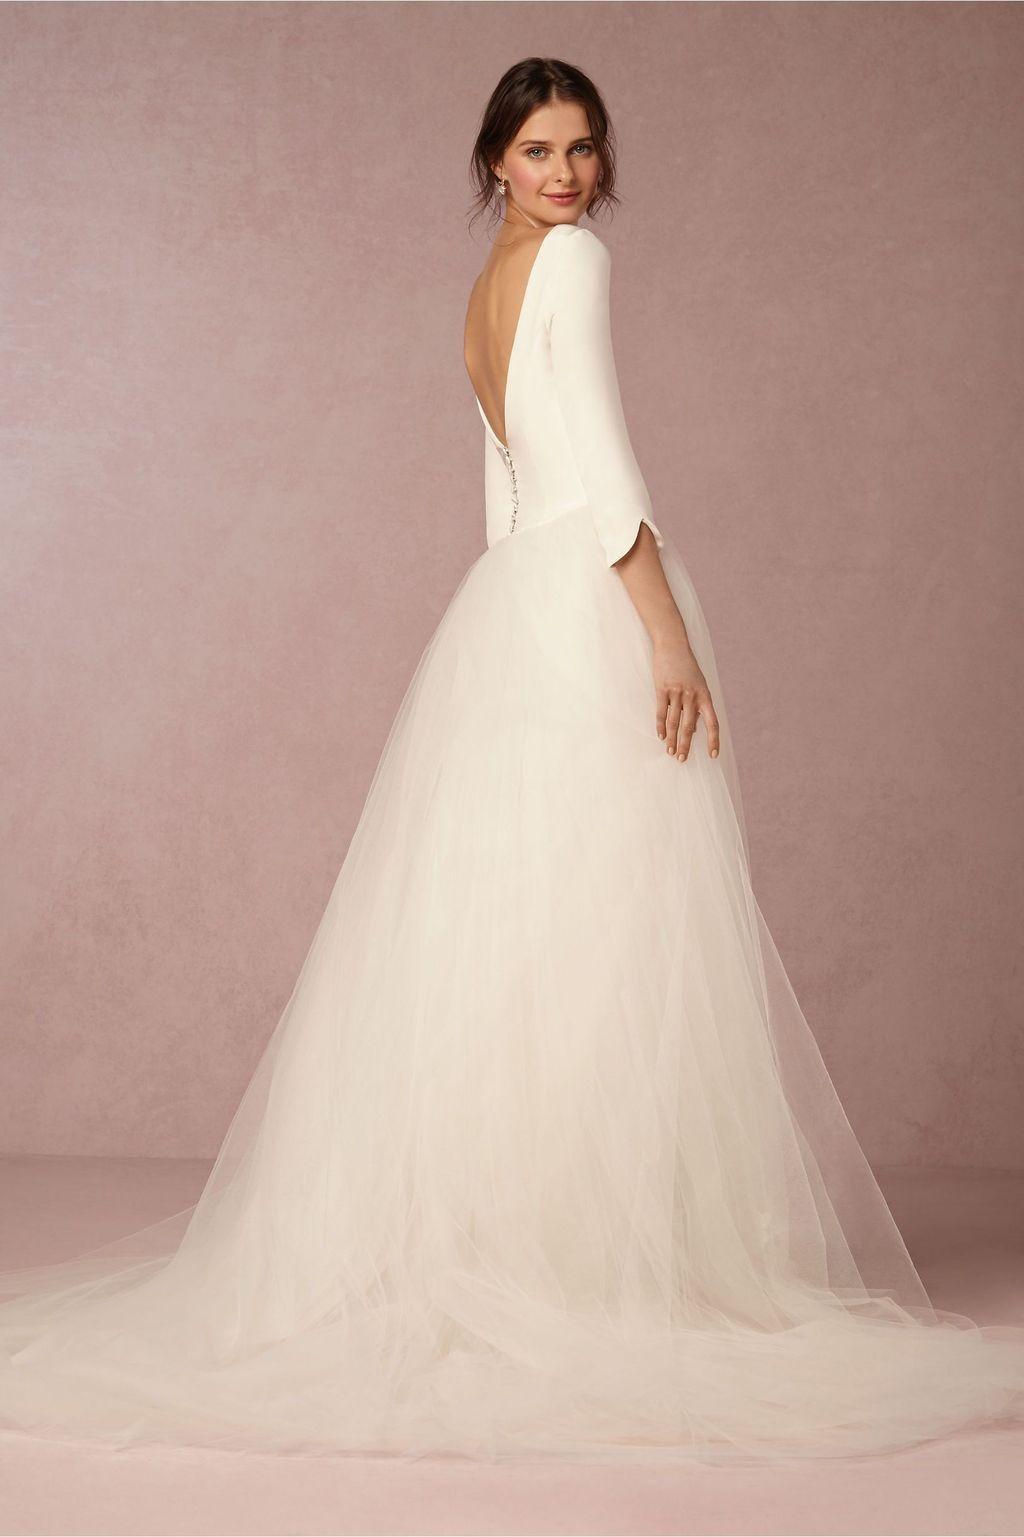 36 Lovely Tulle Wedding Dress Ideas | Vestidos de novia civil ...